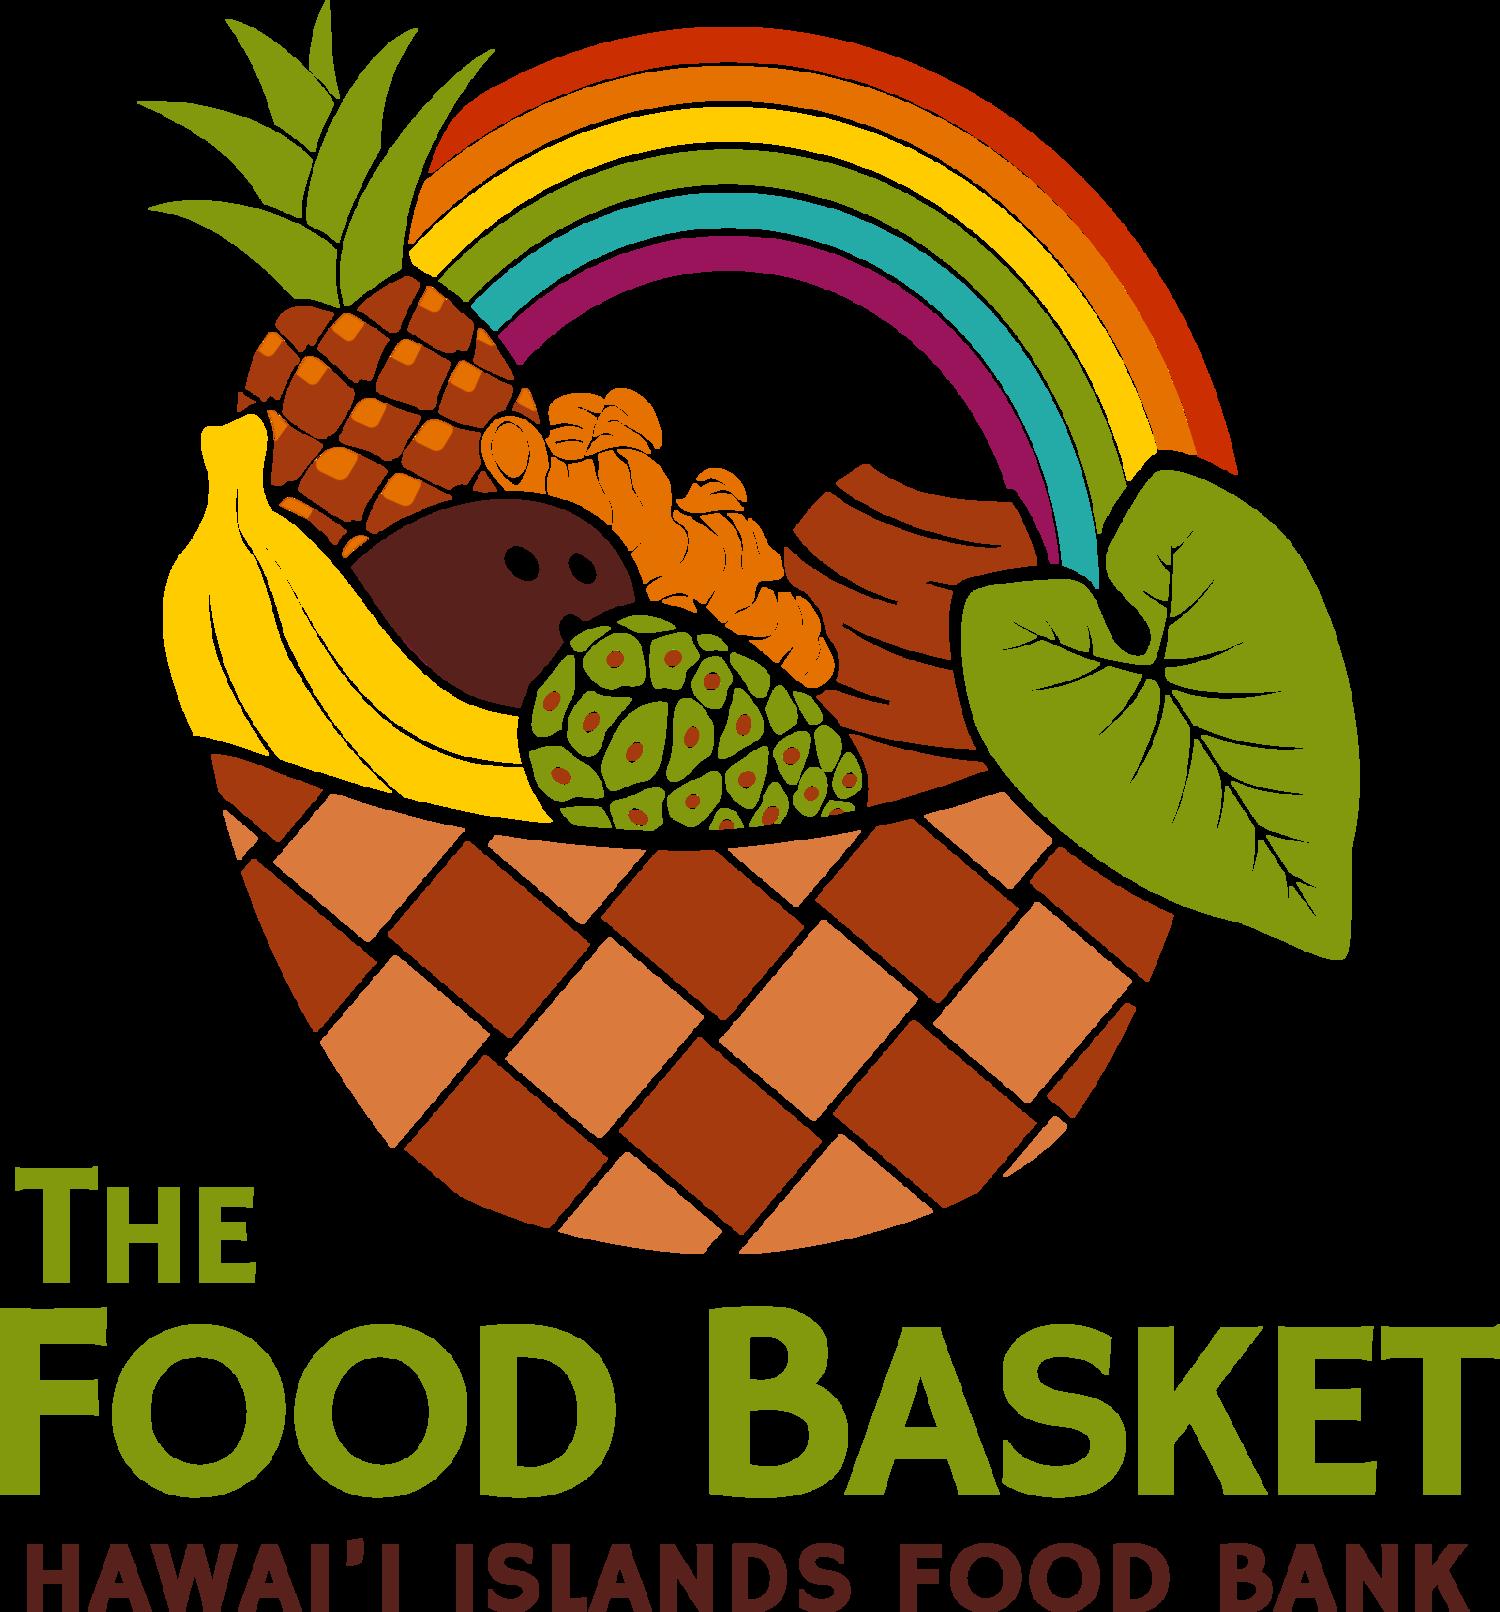 Food basket photo